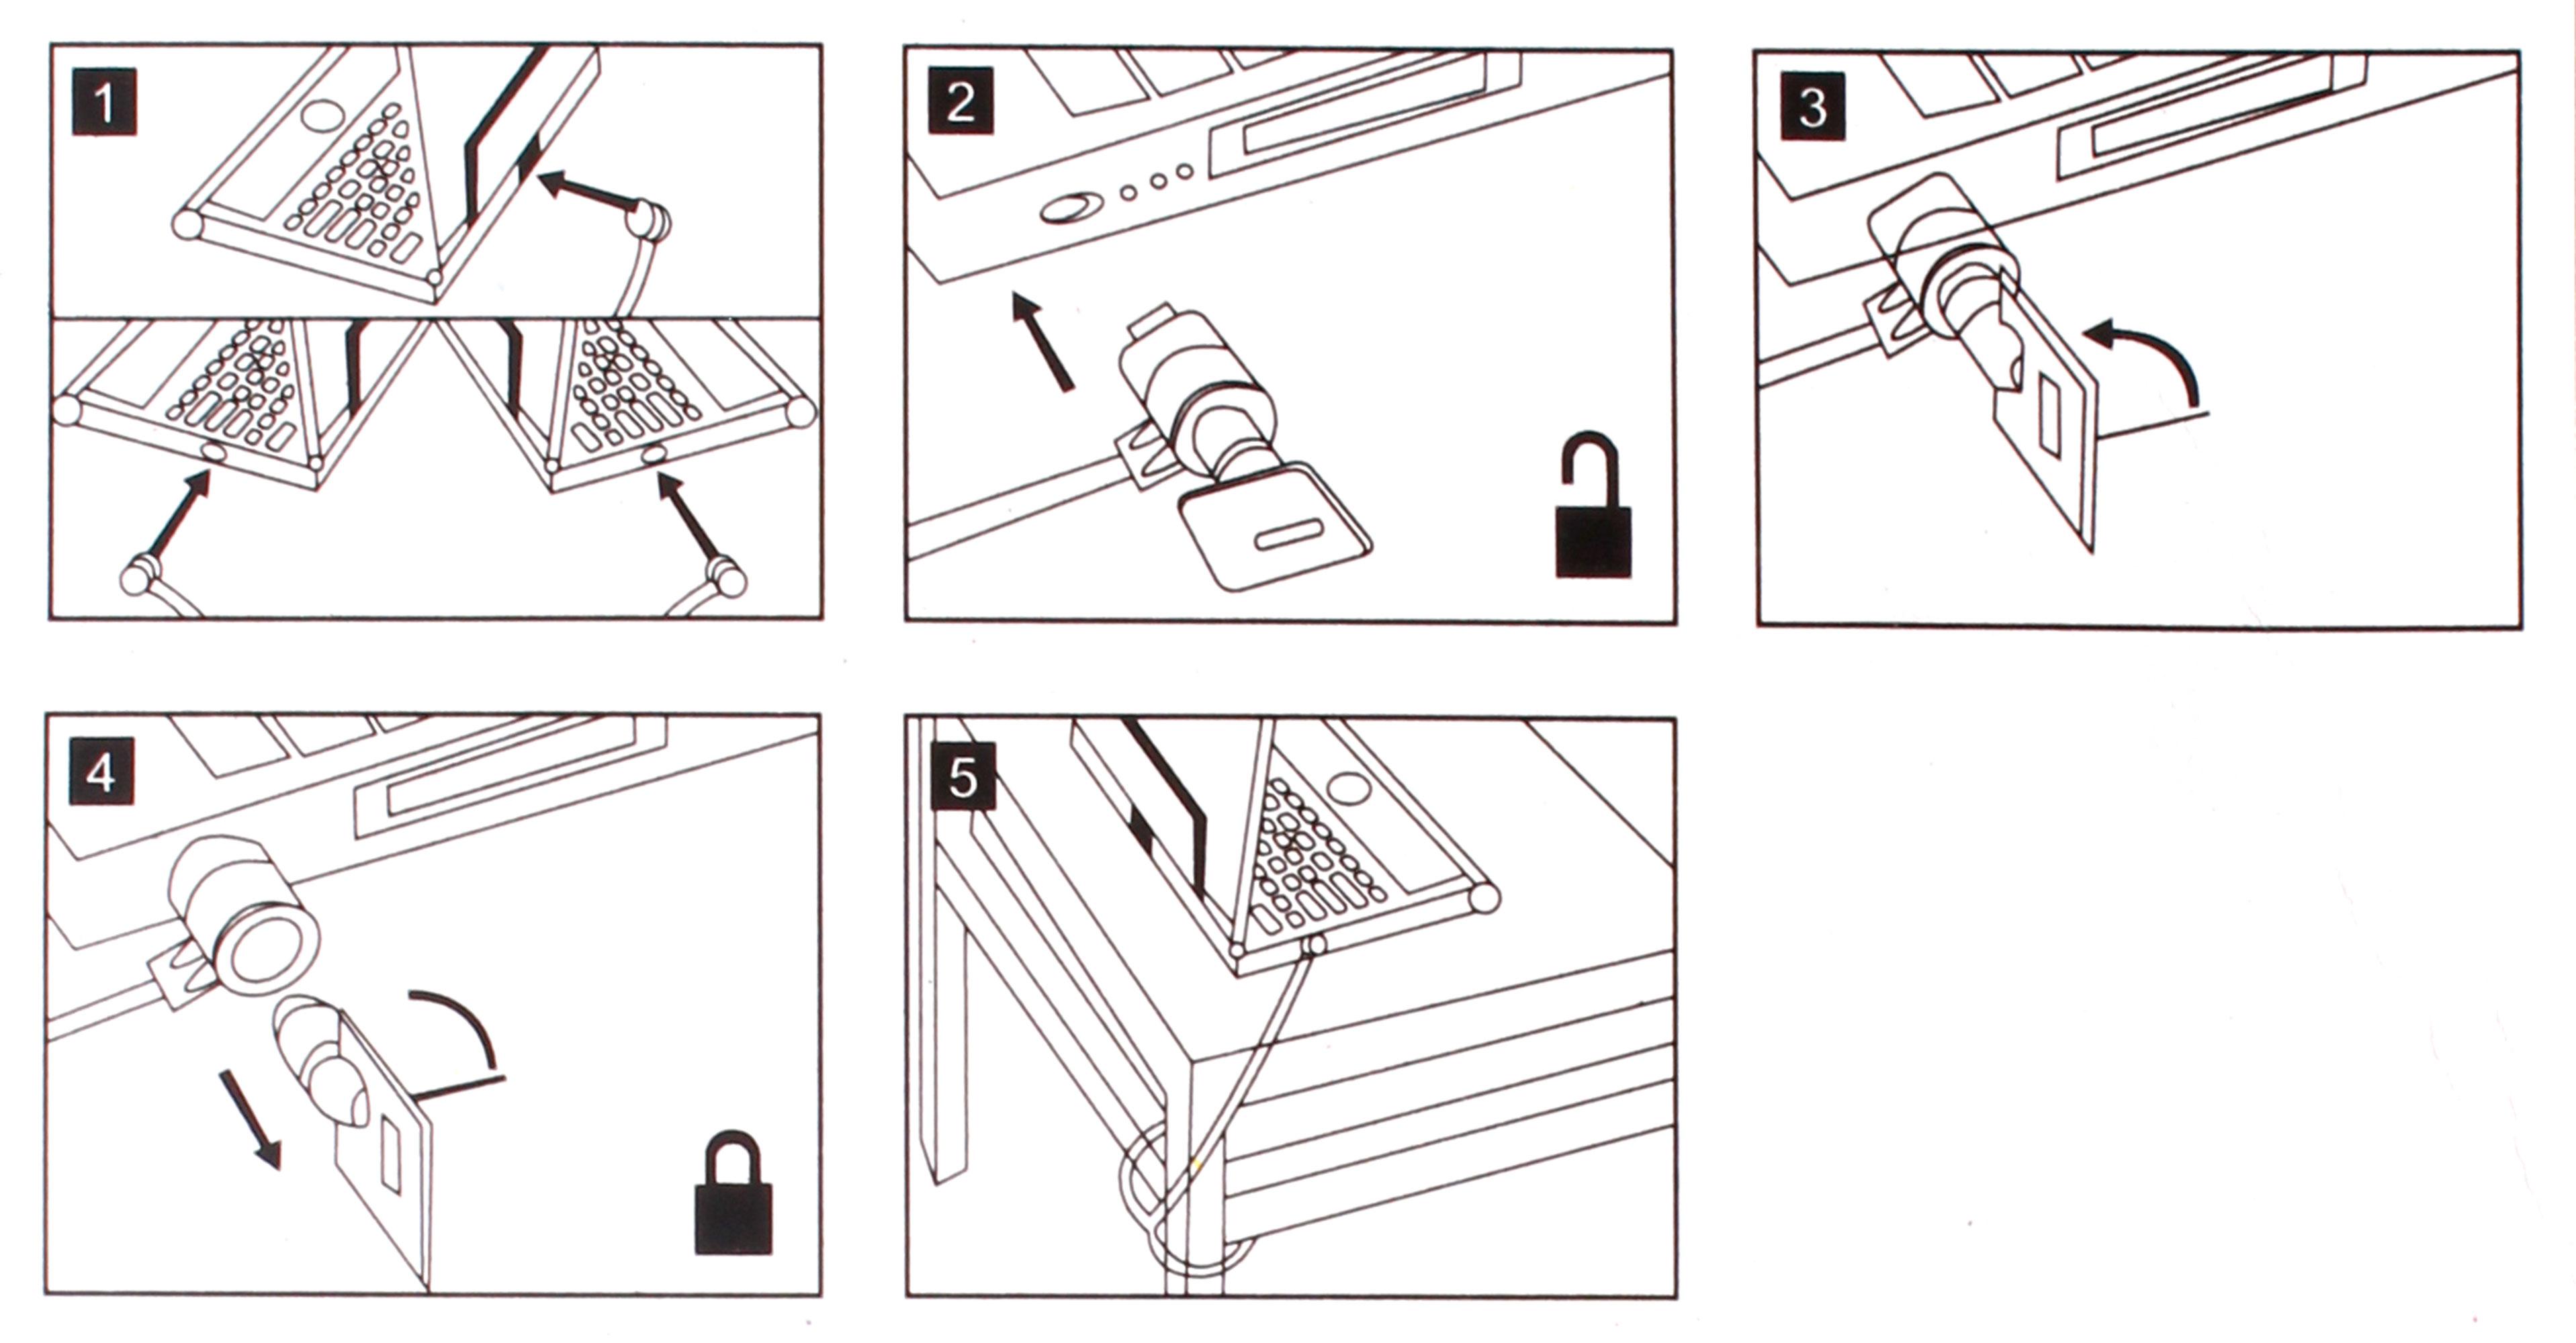 Câble antivol de sécurité à verrou pour Lenovo Ideapad